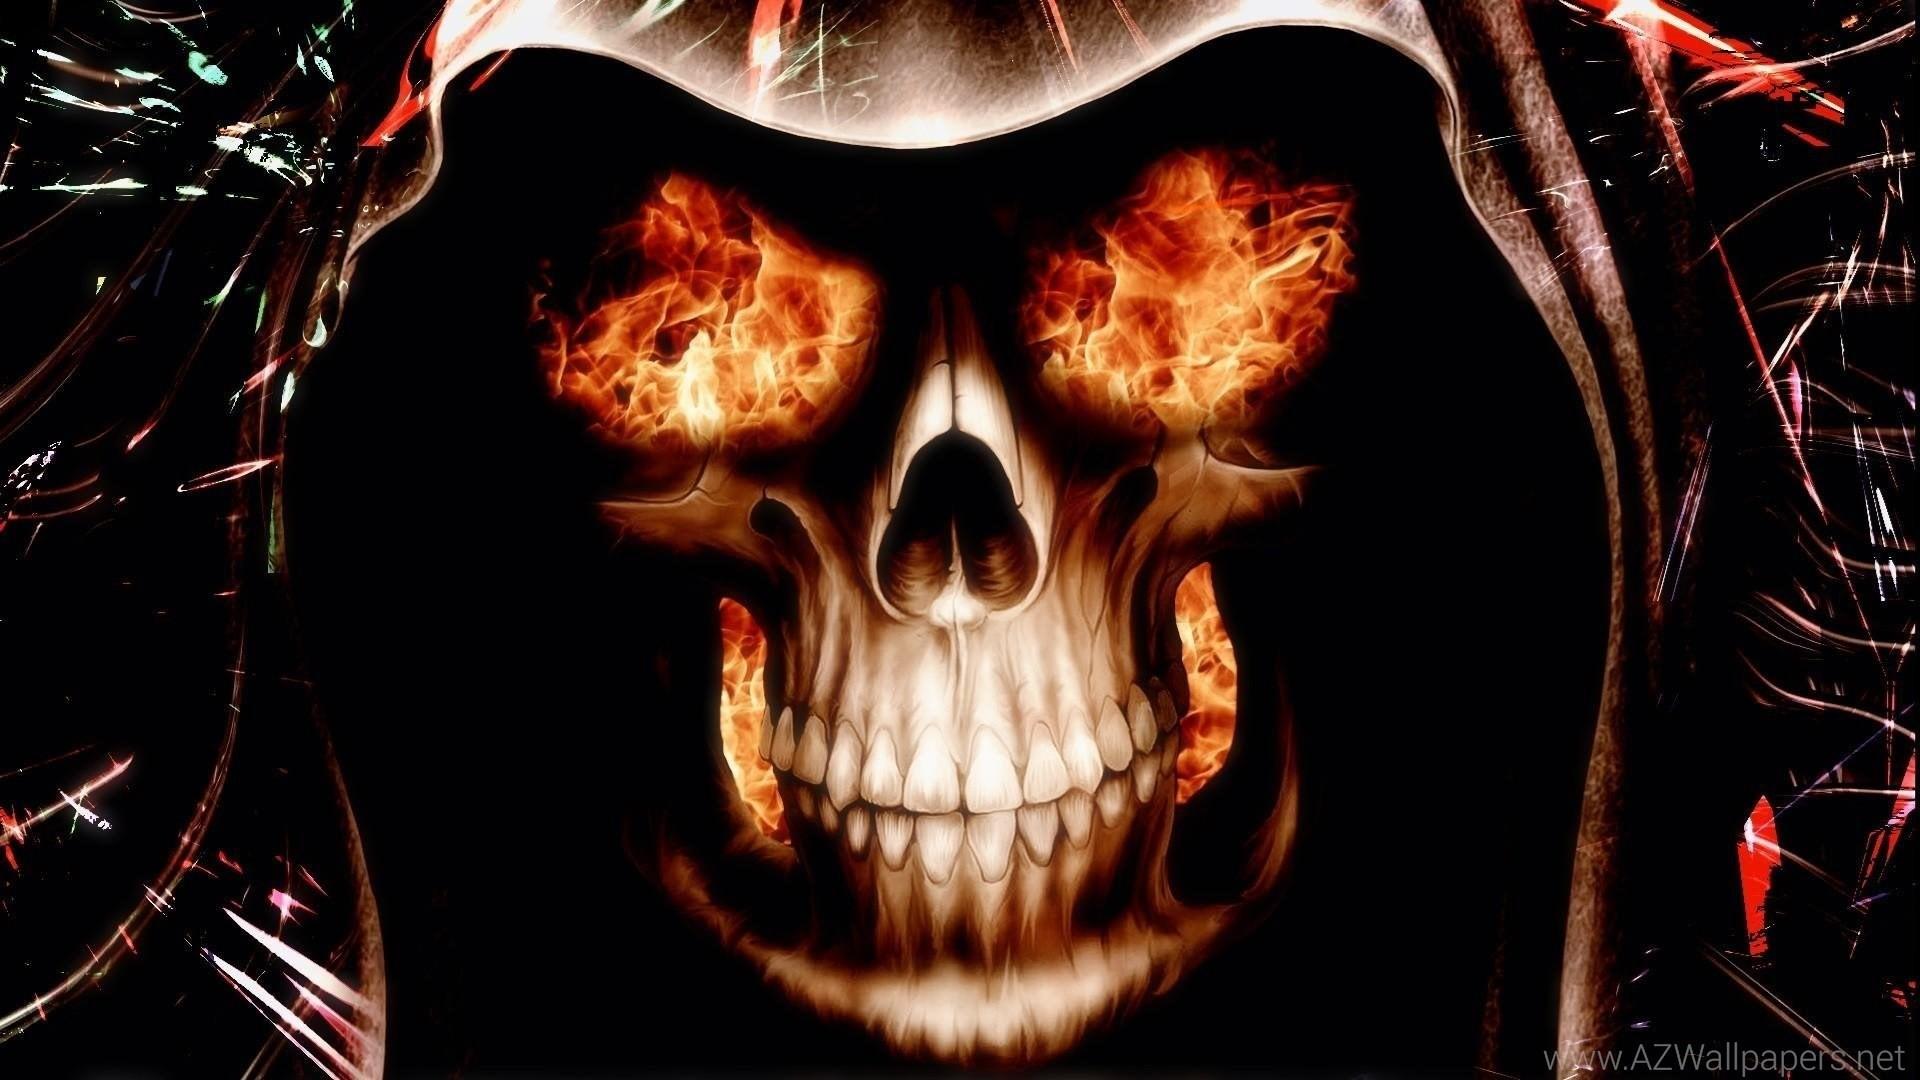 Res: 1920x1080, ... Skull wallpapers hd-fire-skull-wallpapers ...